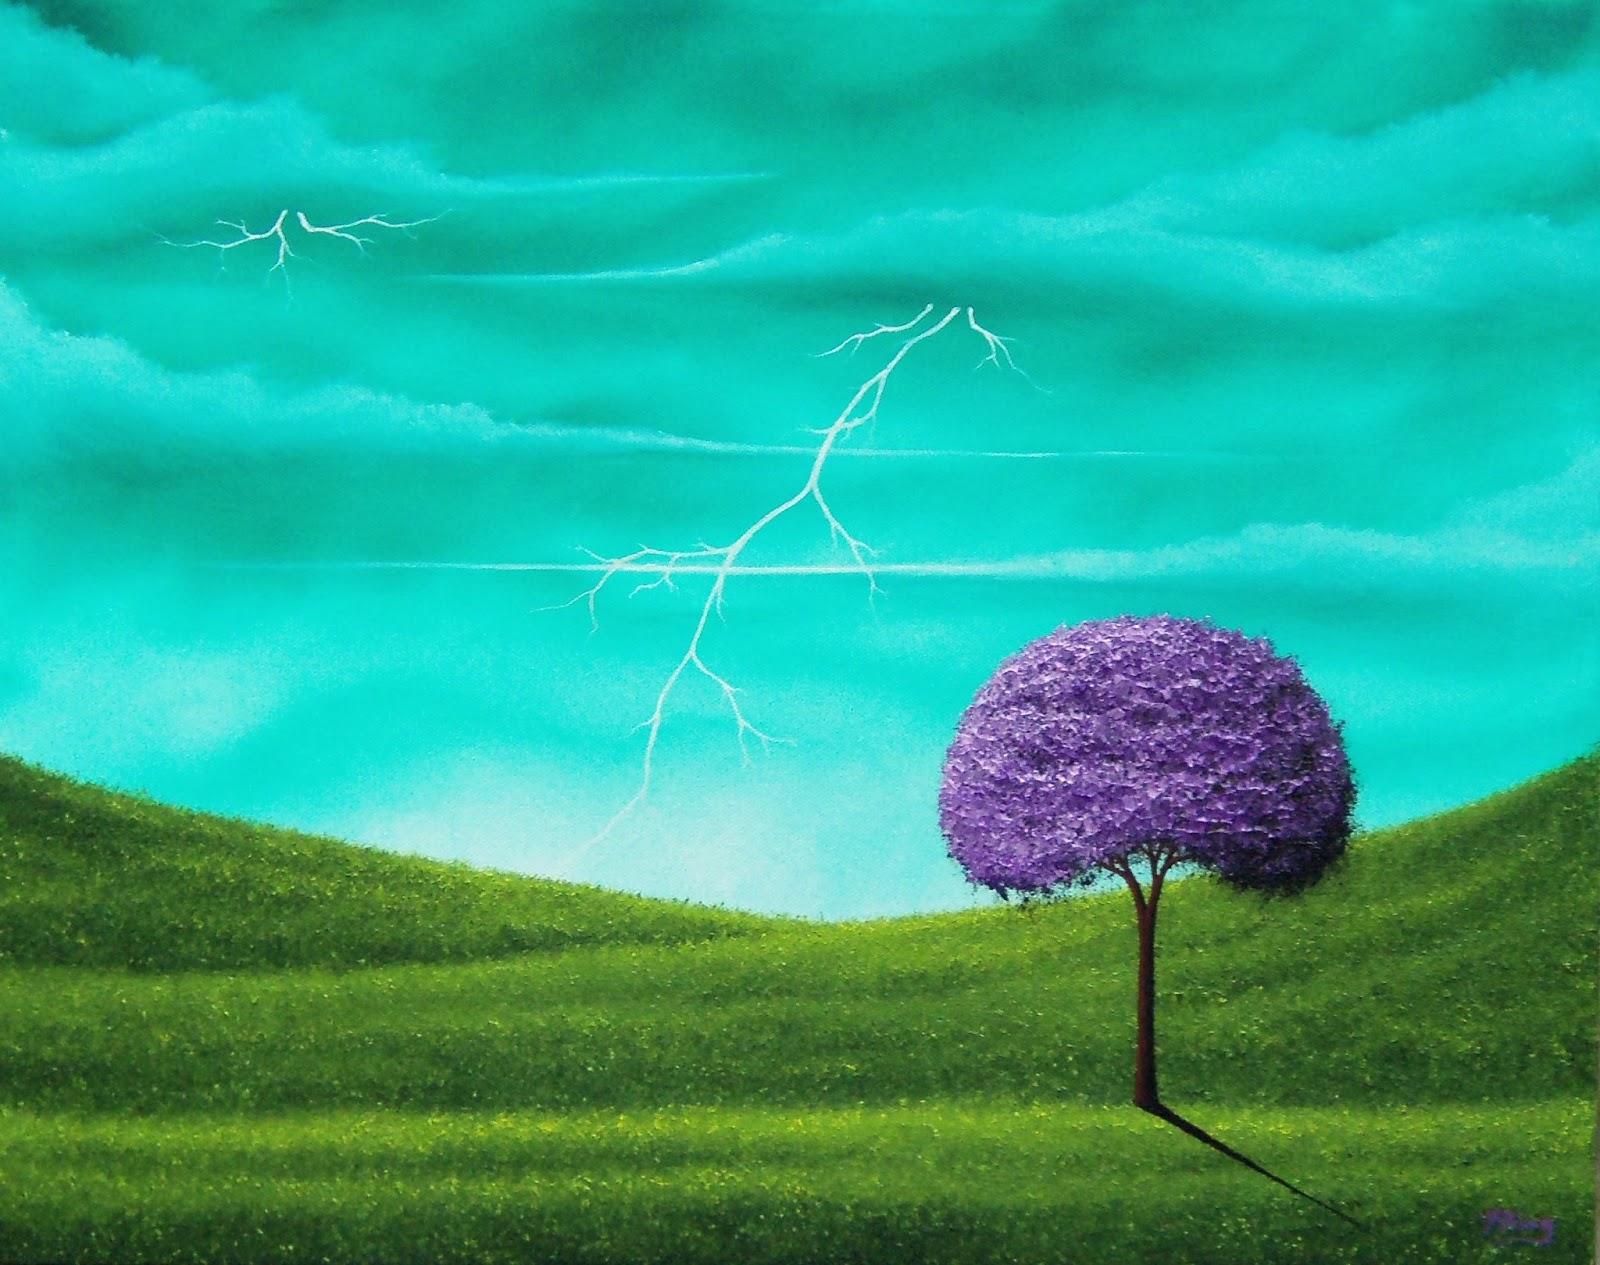 Lightning storm painting